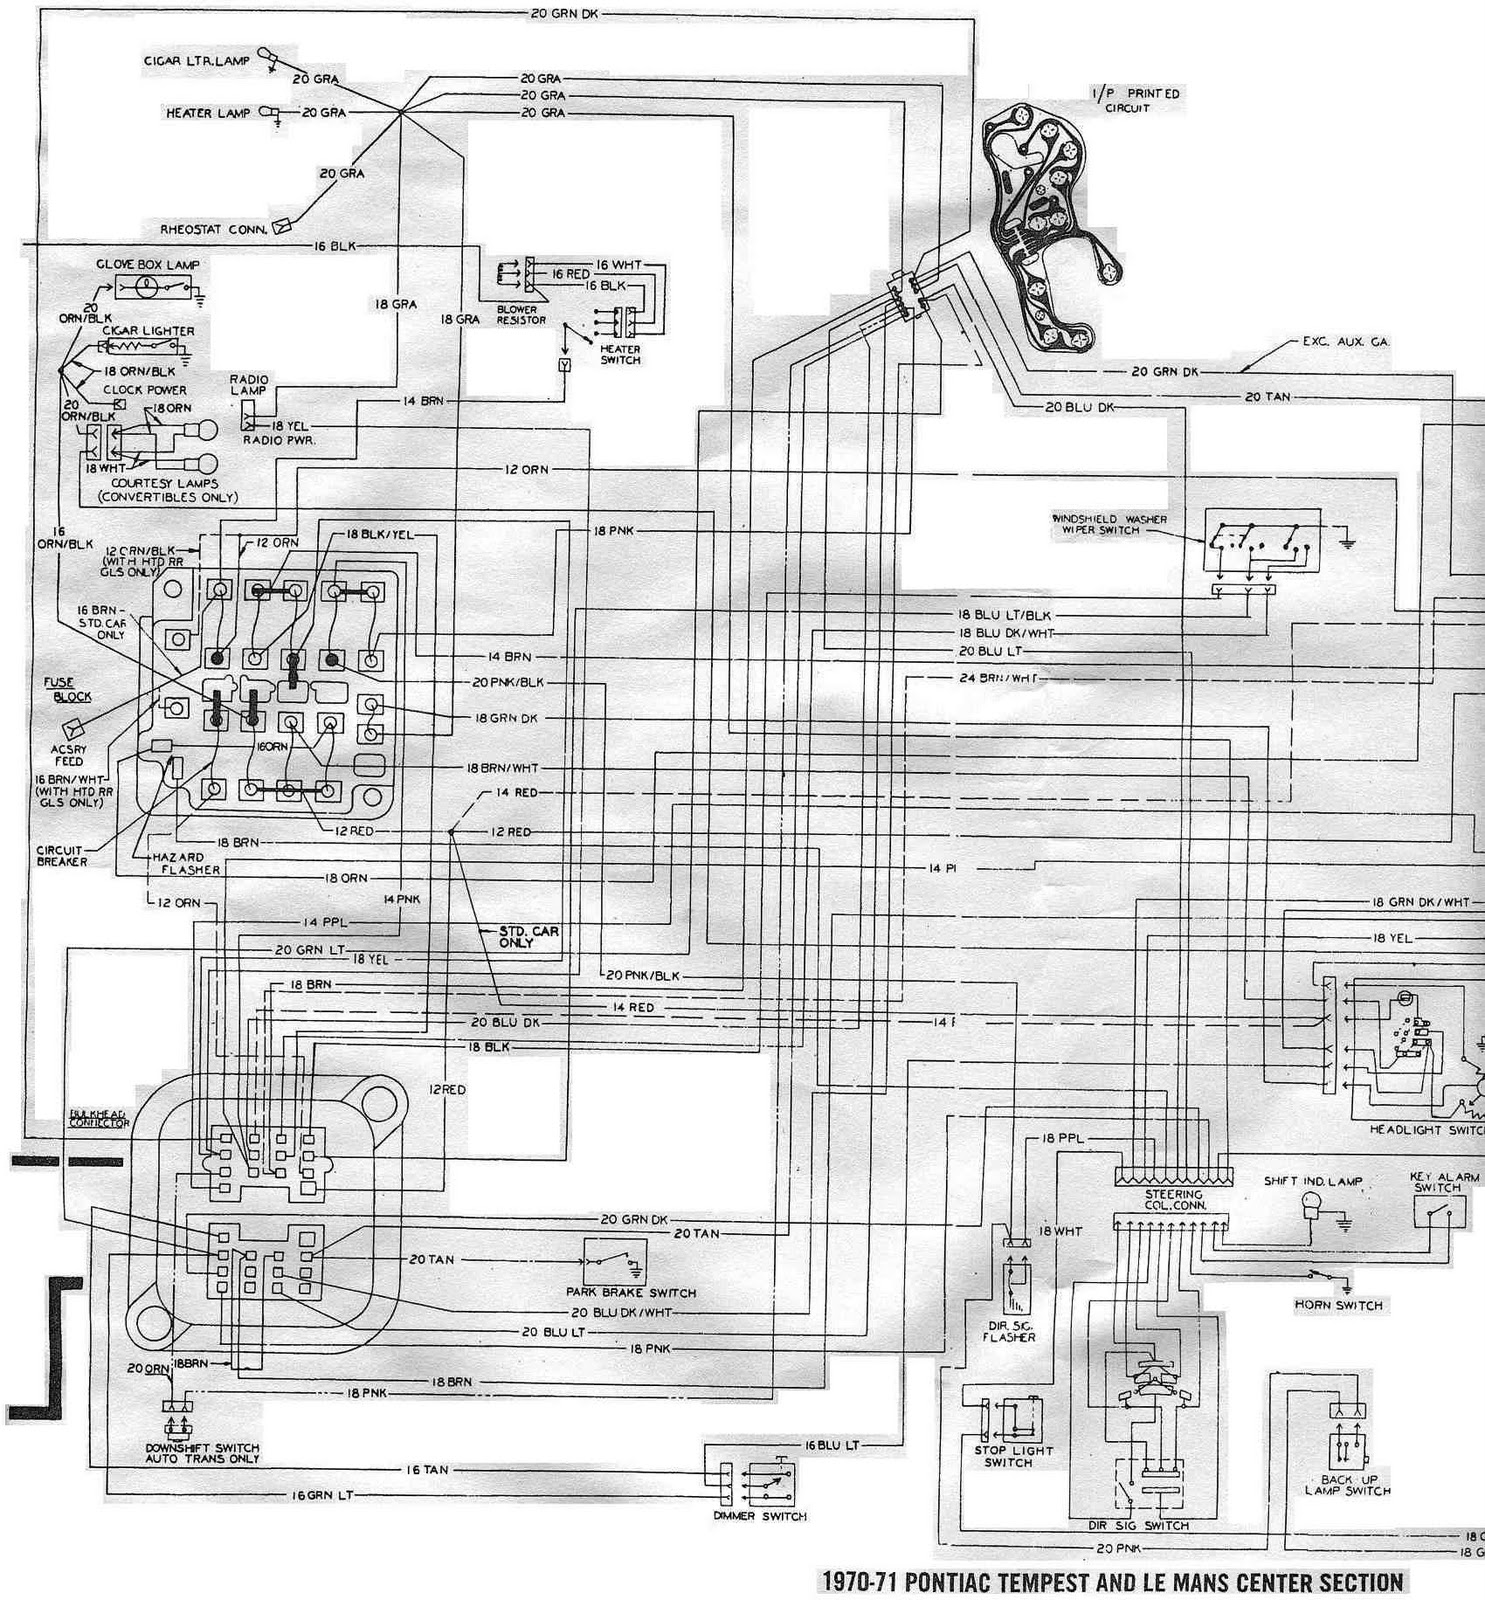 Mustang Wiring Diagram Furthermore 1965 Ford Galaxie 1972 Tach 67 Gto Schematic Diagrams U2022 Rh Arcomics Co